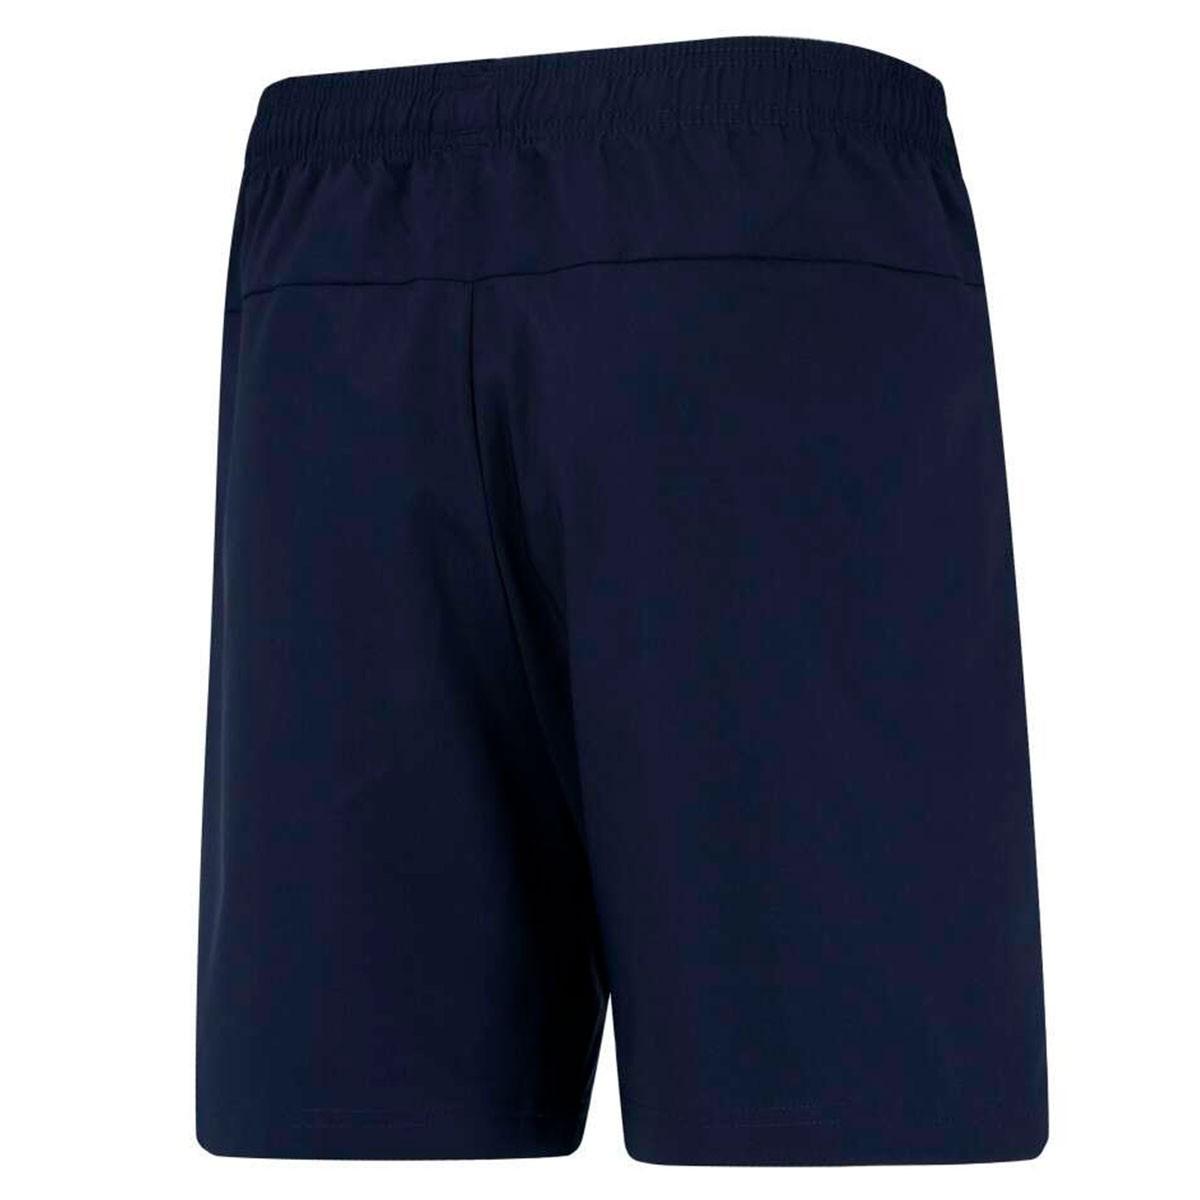 Bermuda Adidas Essentials Lnr Chelsea Mascul - Marinho